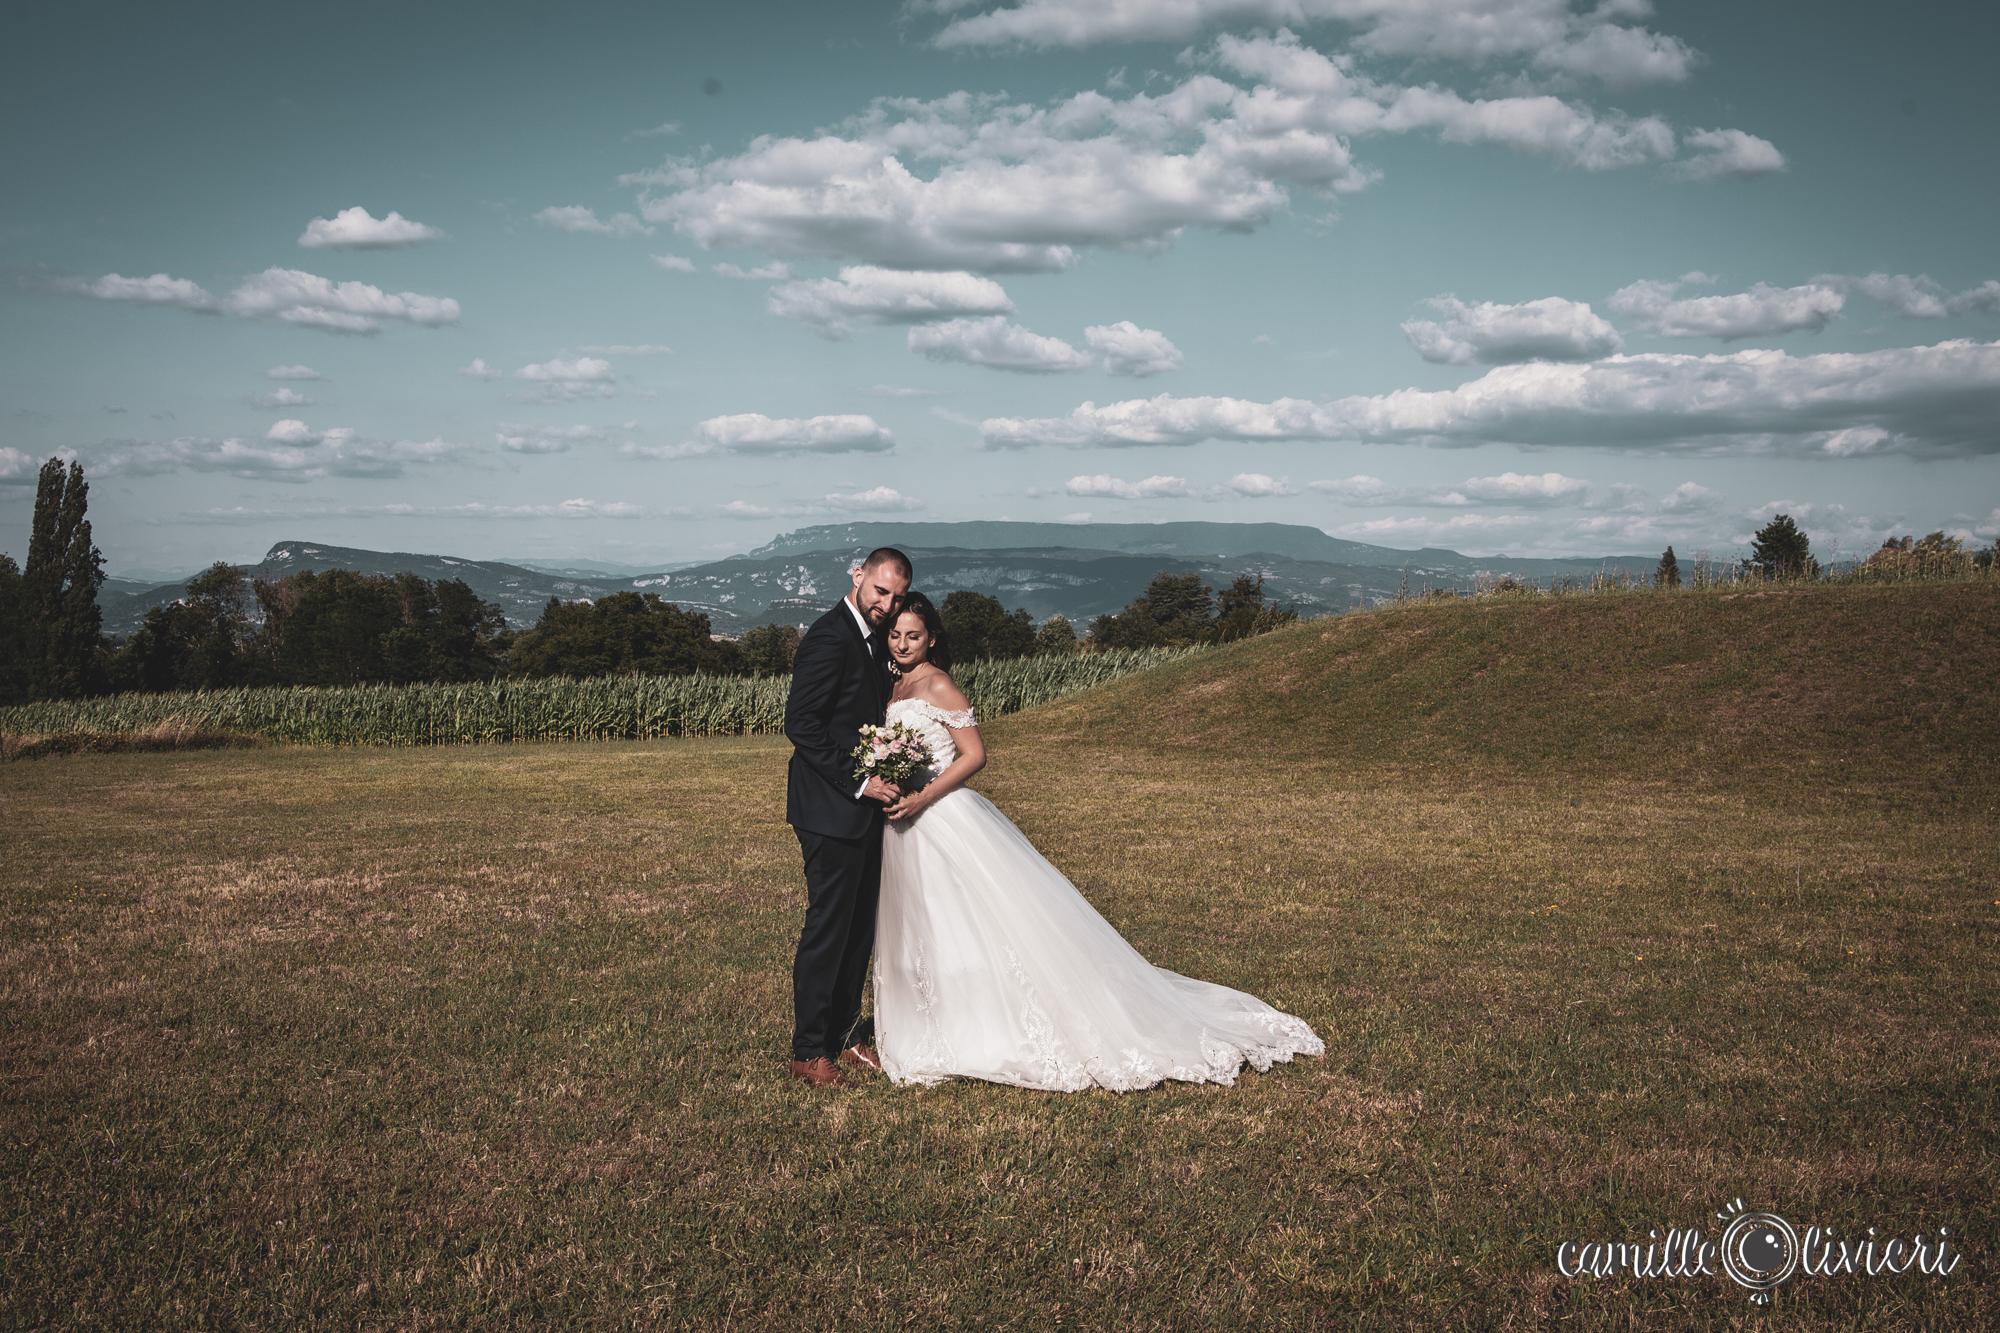 photographe_grenoble_mariage-camille-olivieri-67